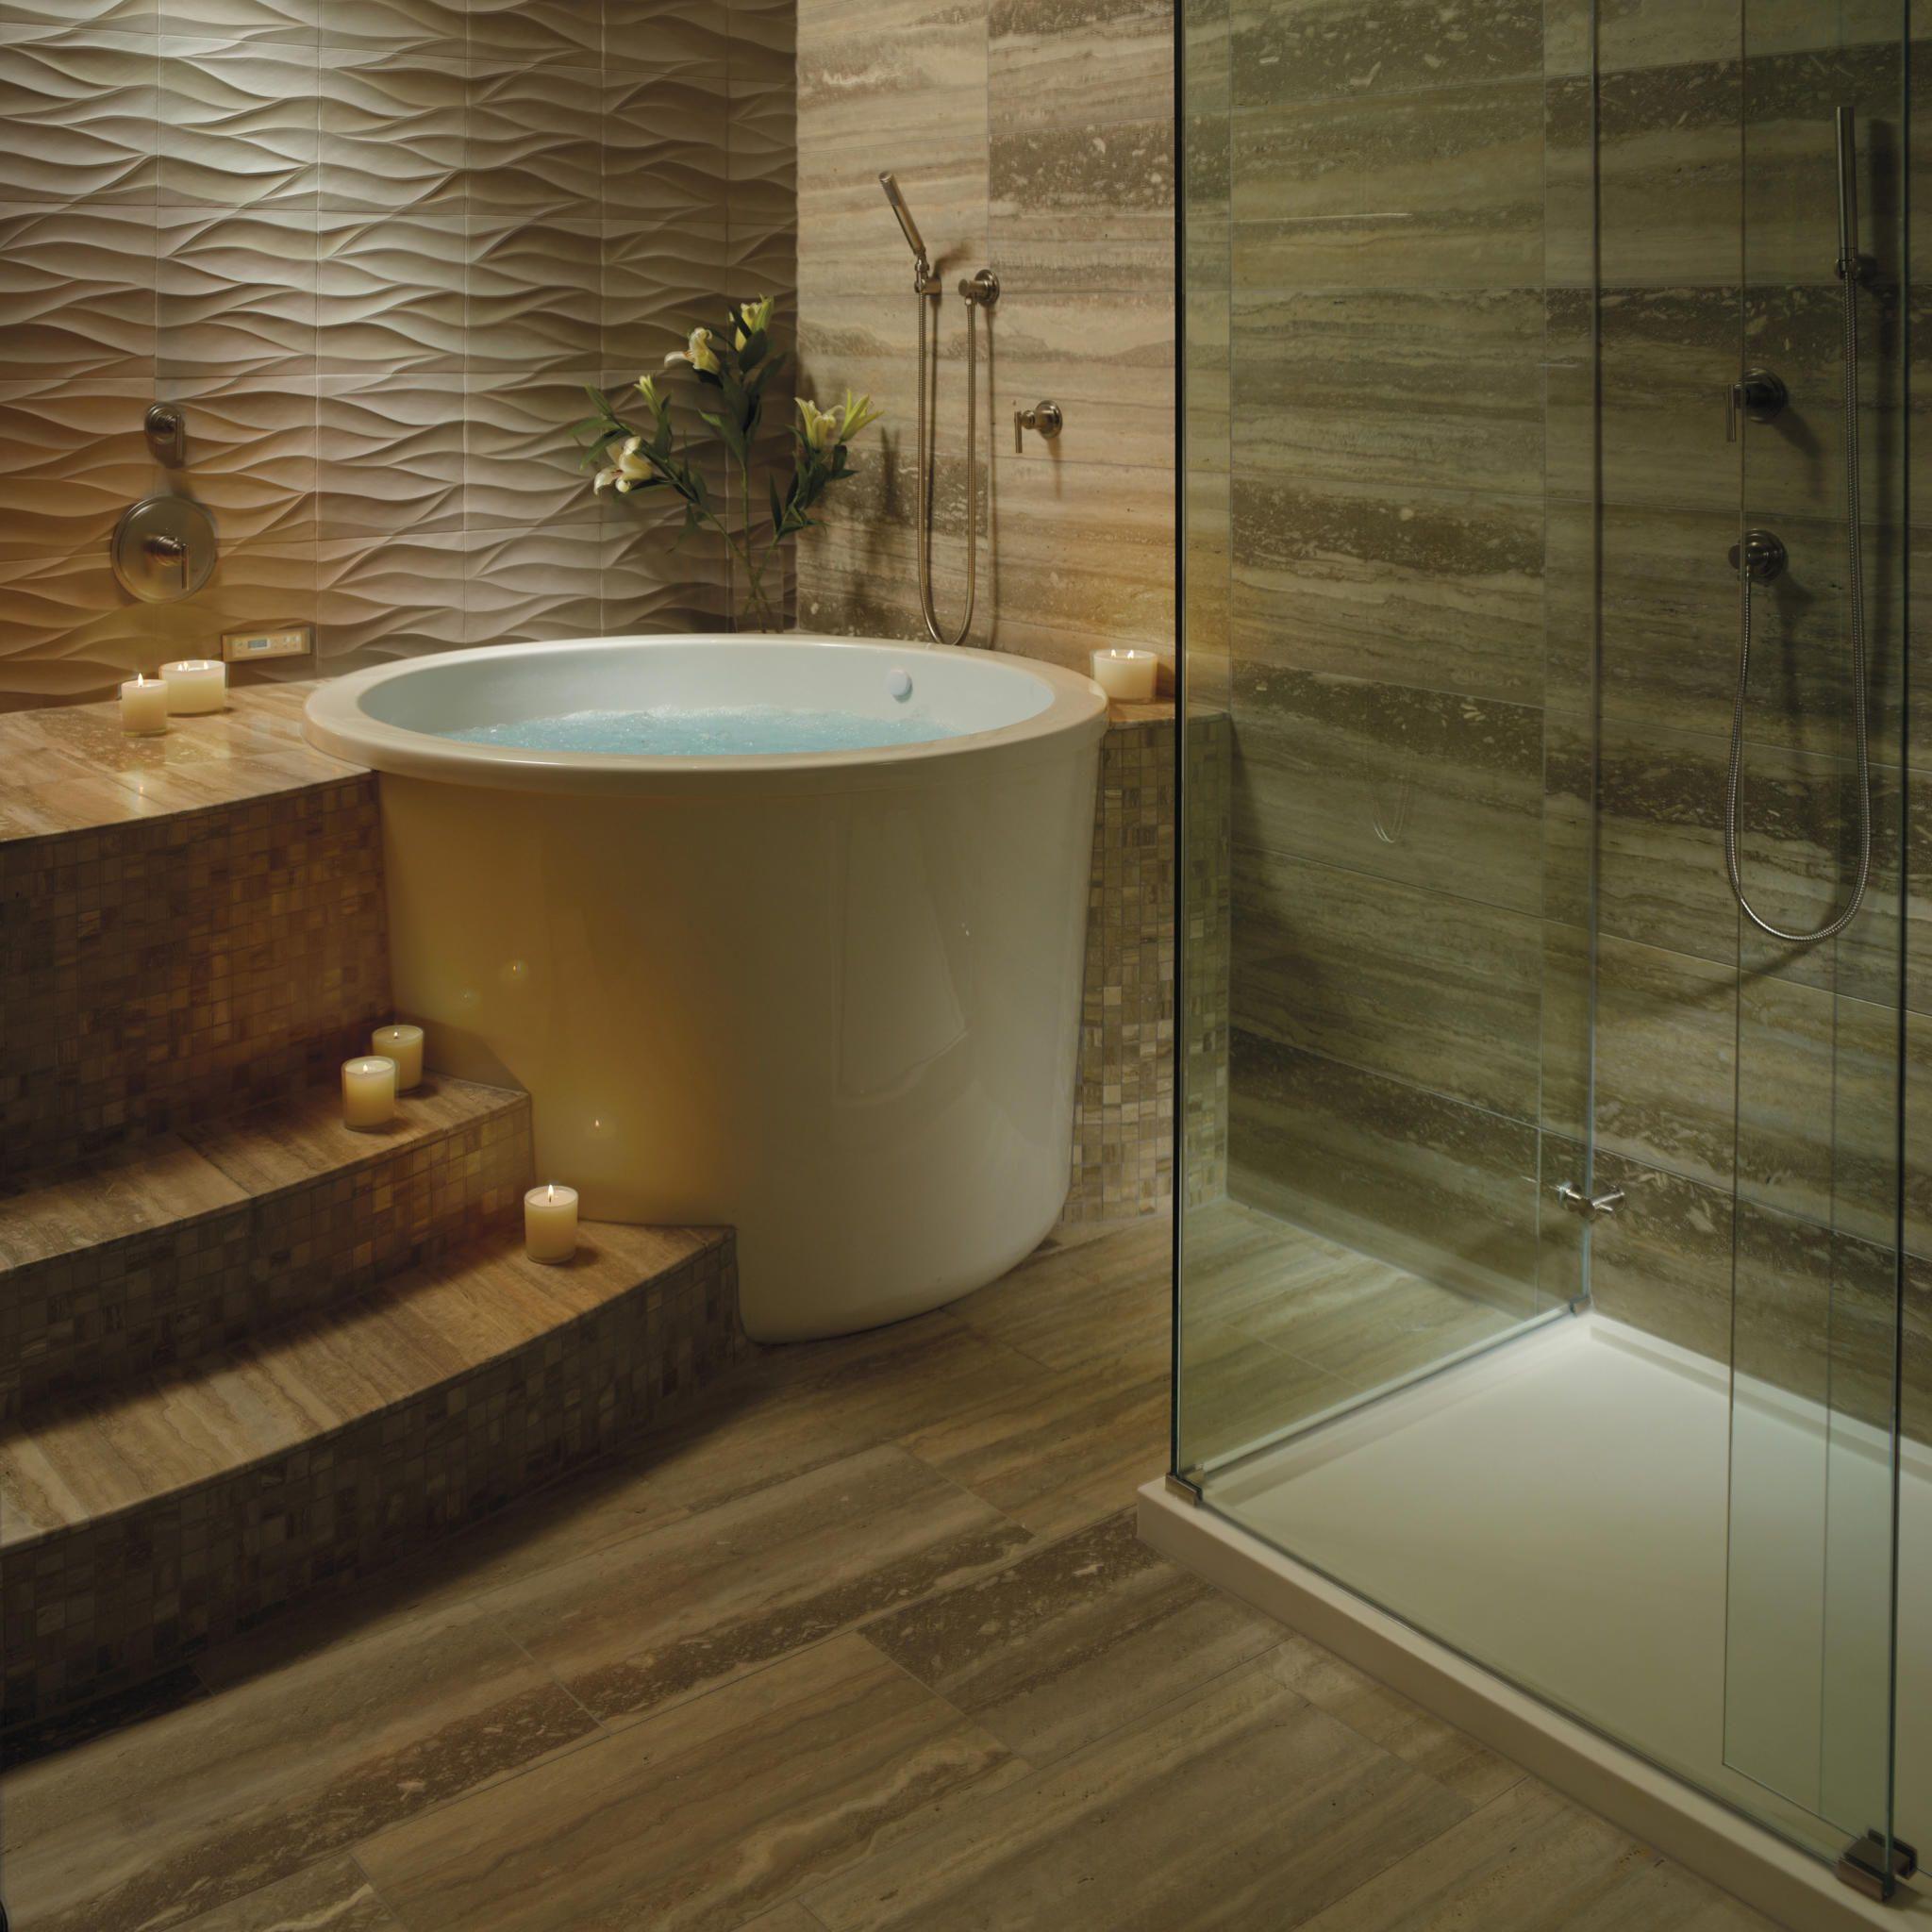 Compact comfort the japanese tub qb blog soaker tub